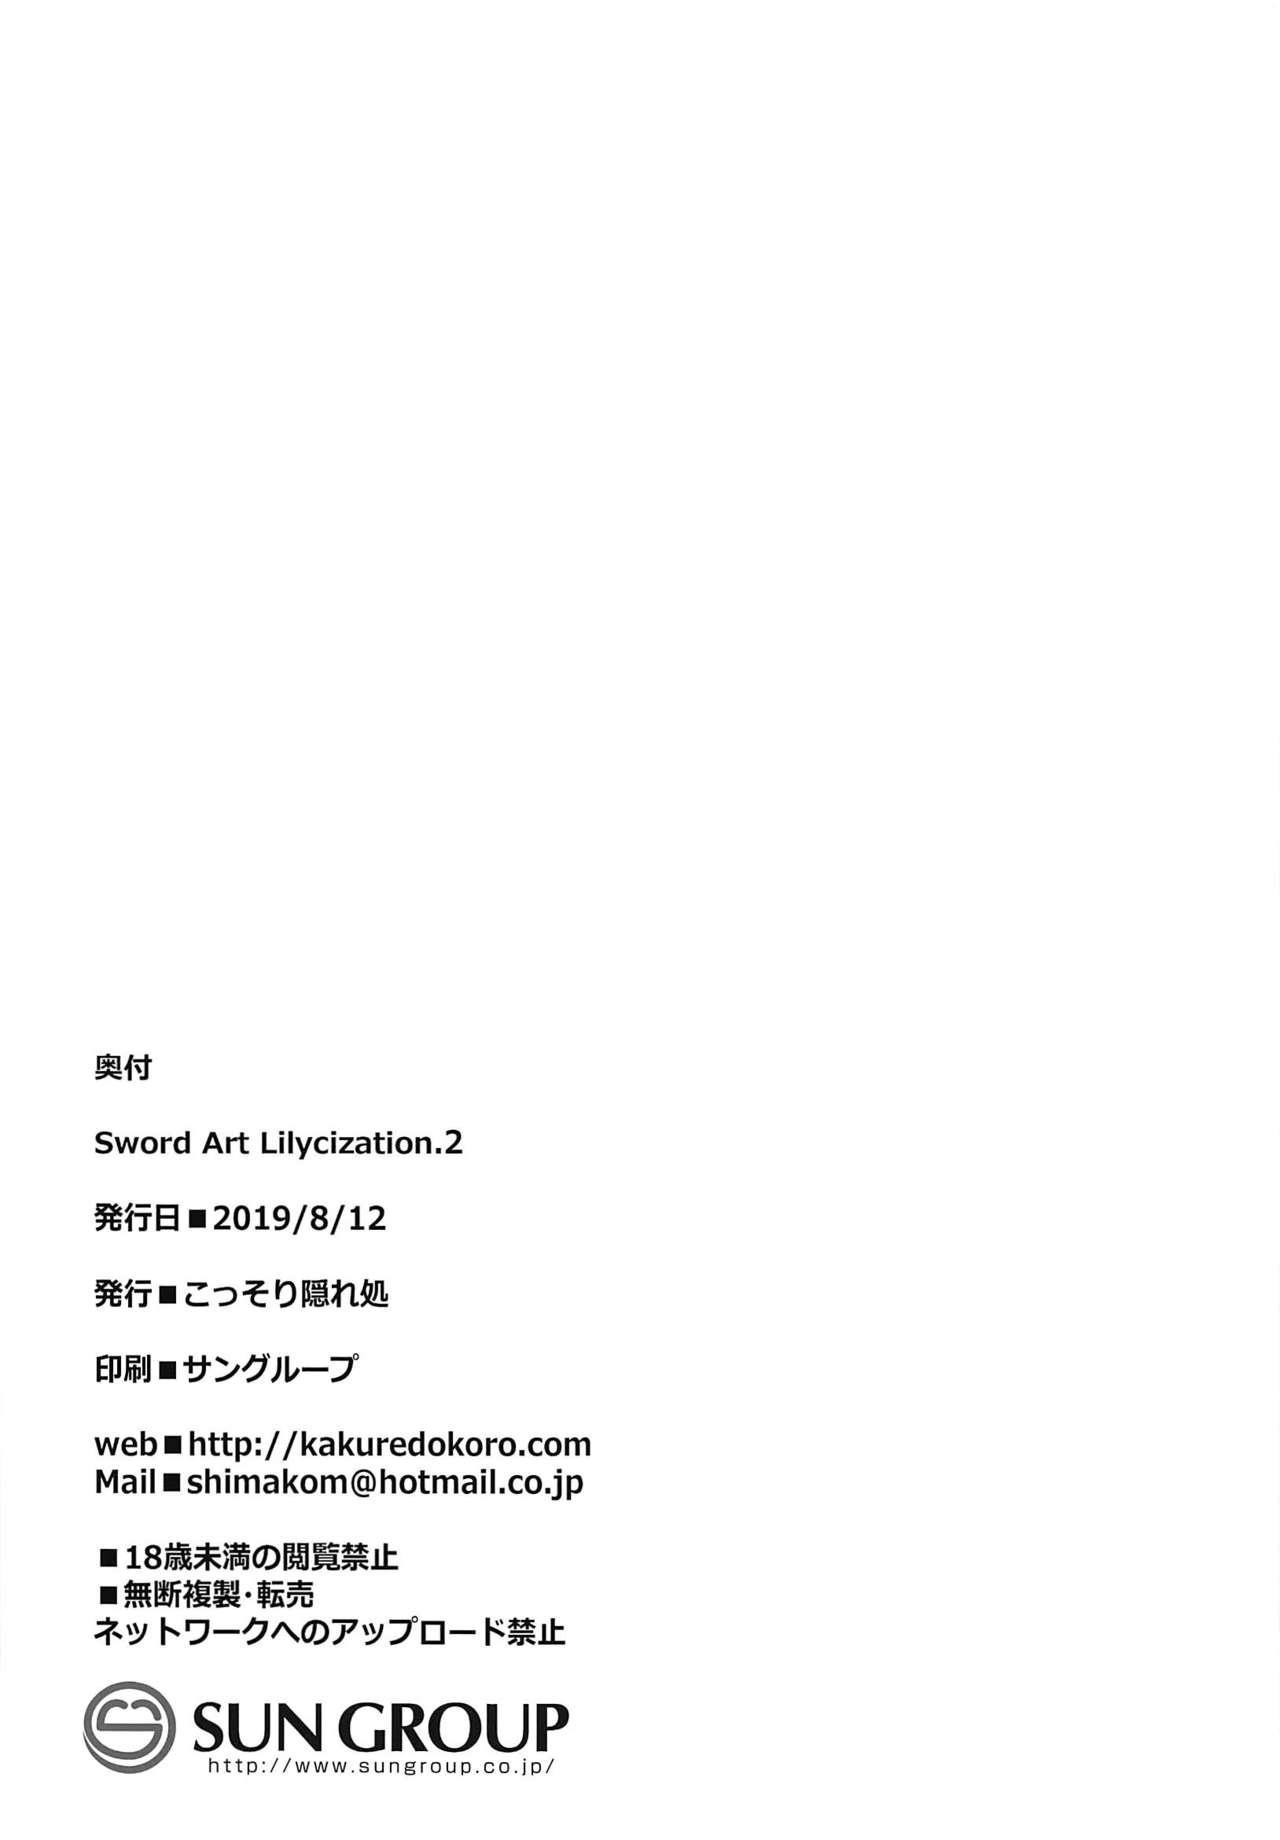 Sword Art Lilycization.2 22